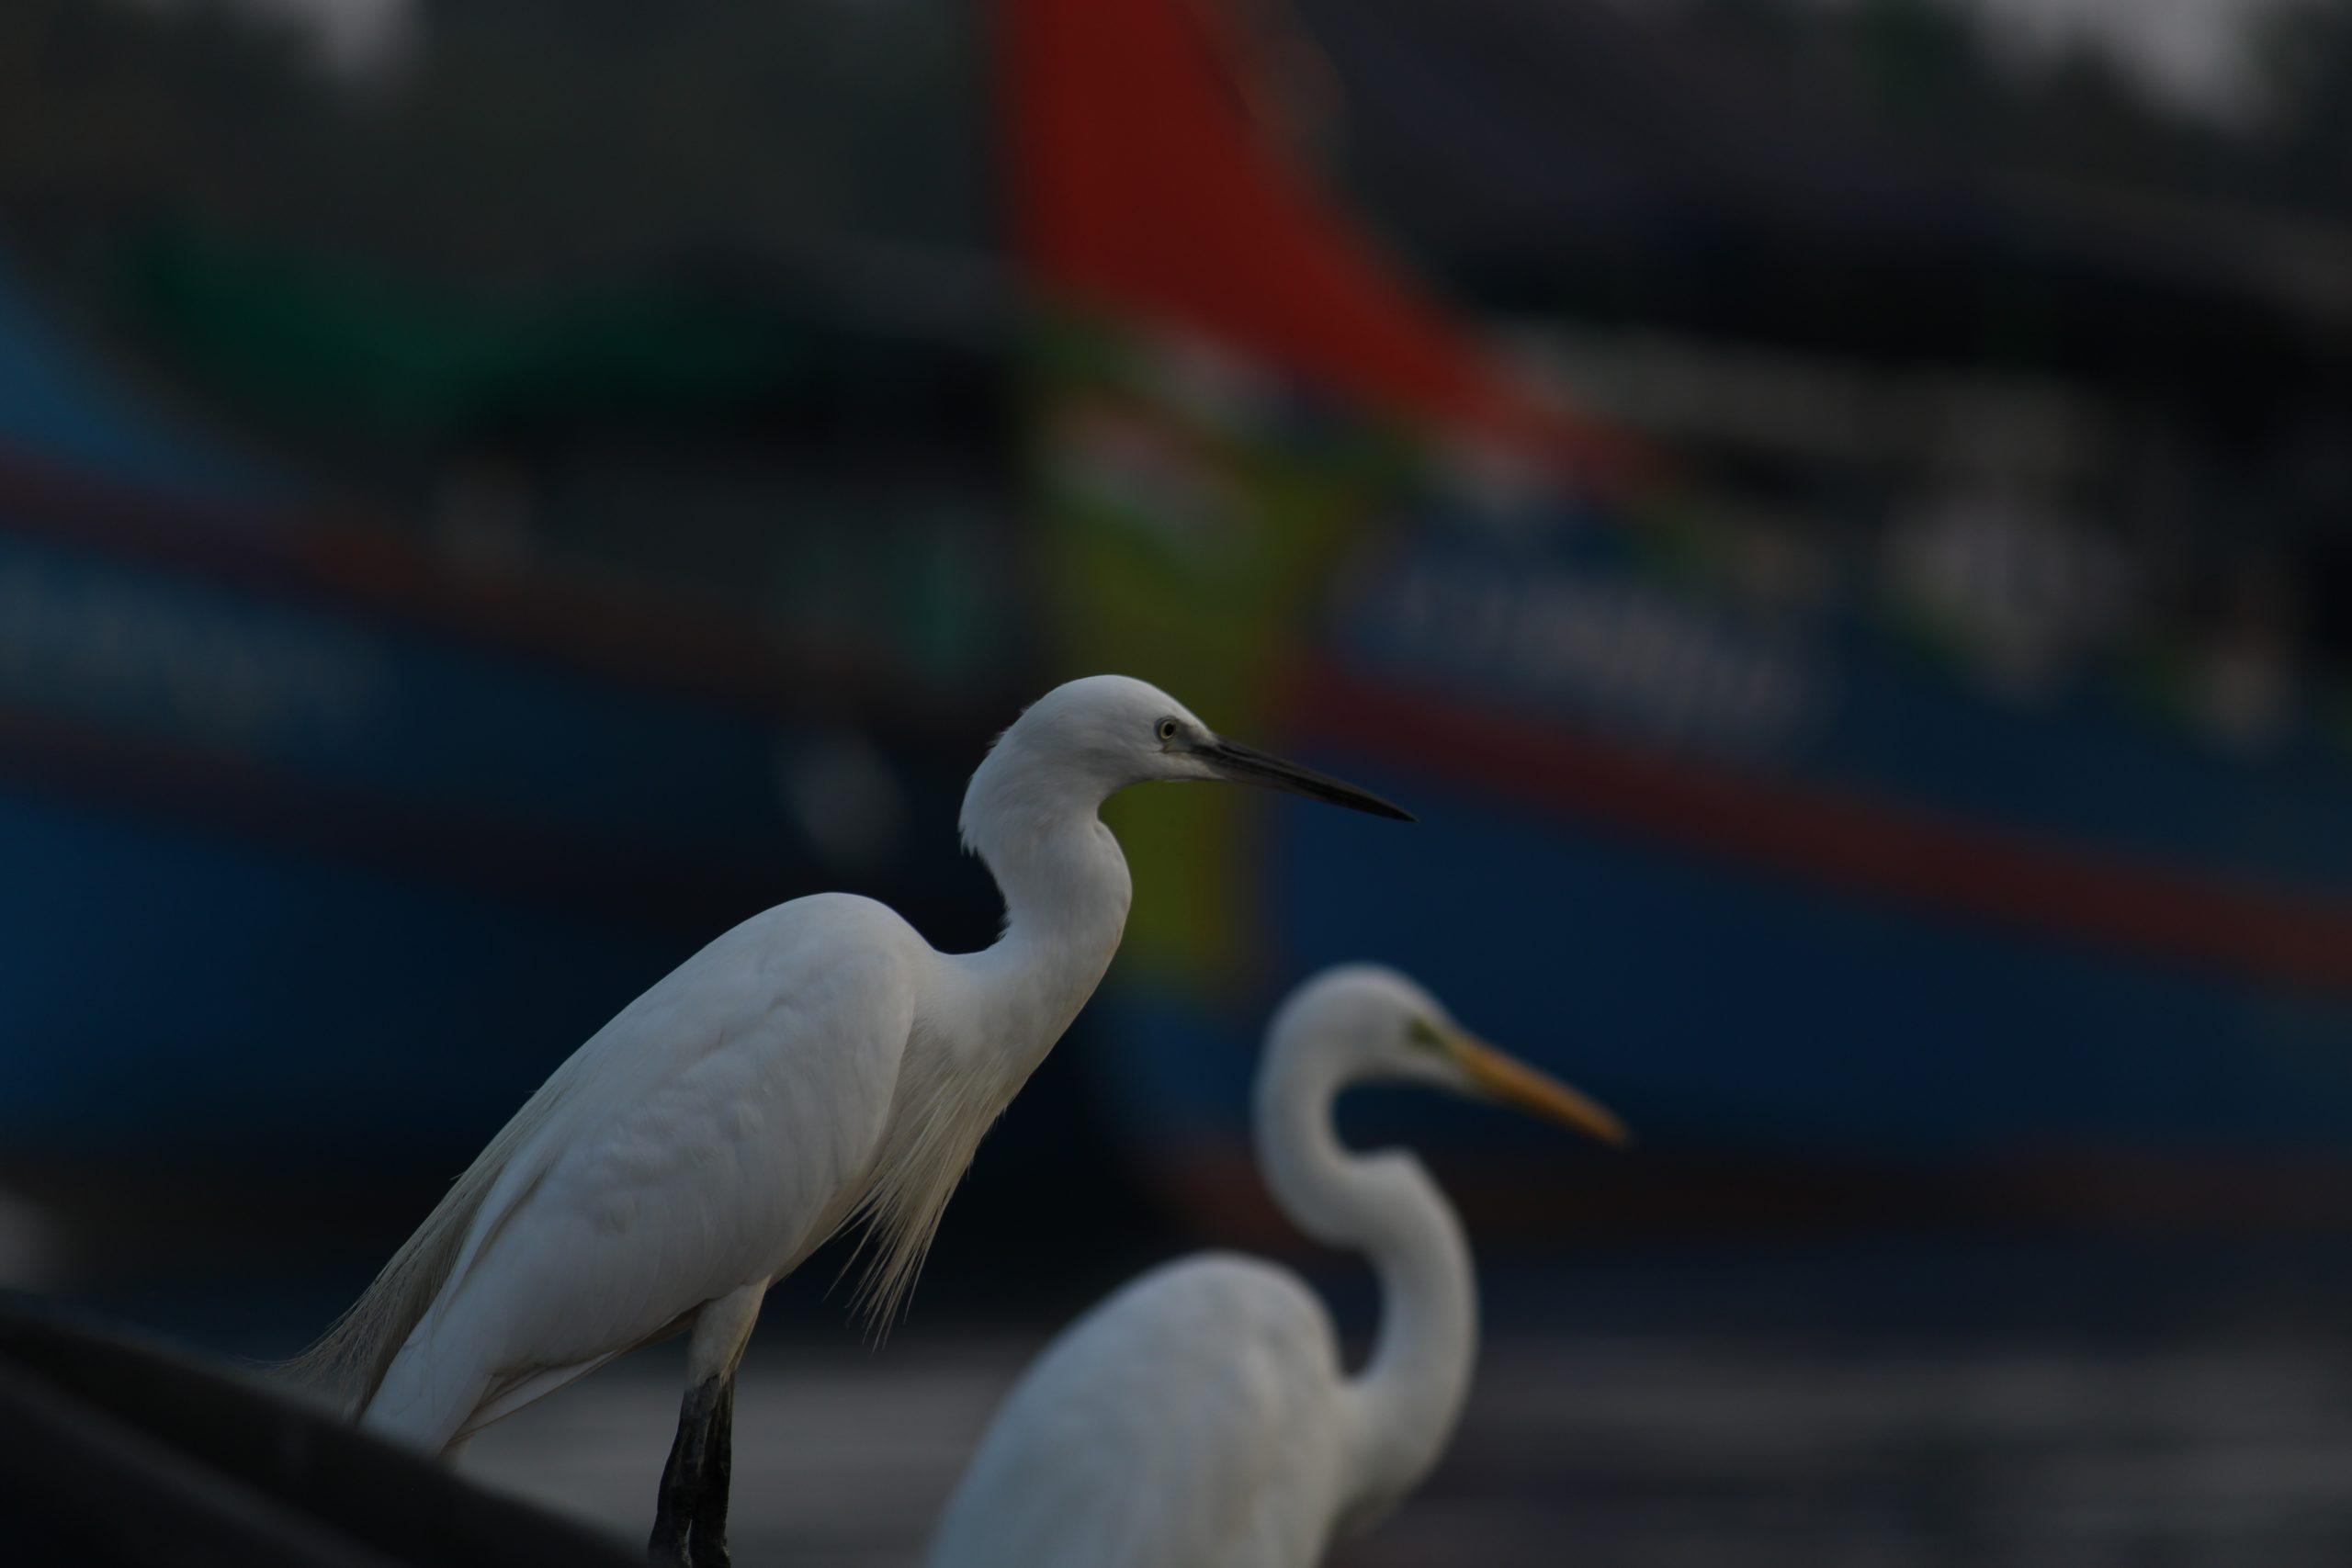 Crane birds sitting river side